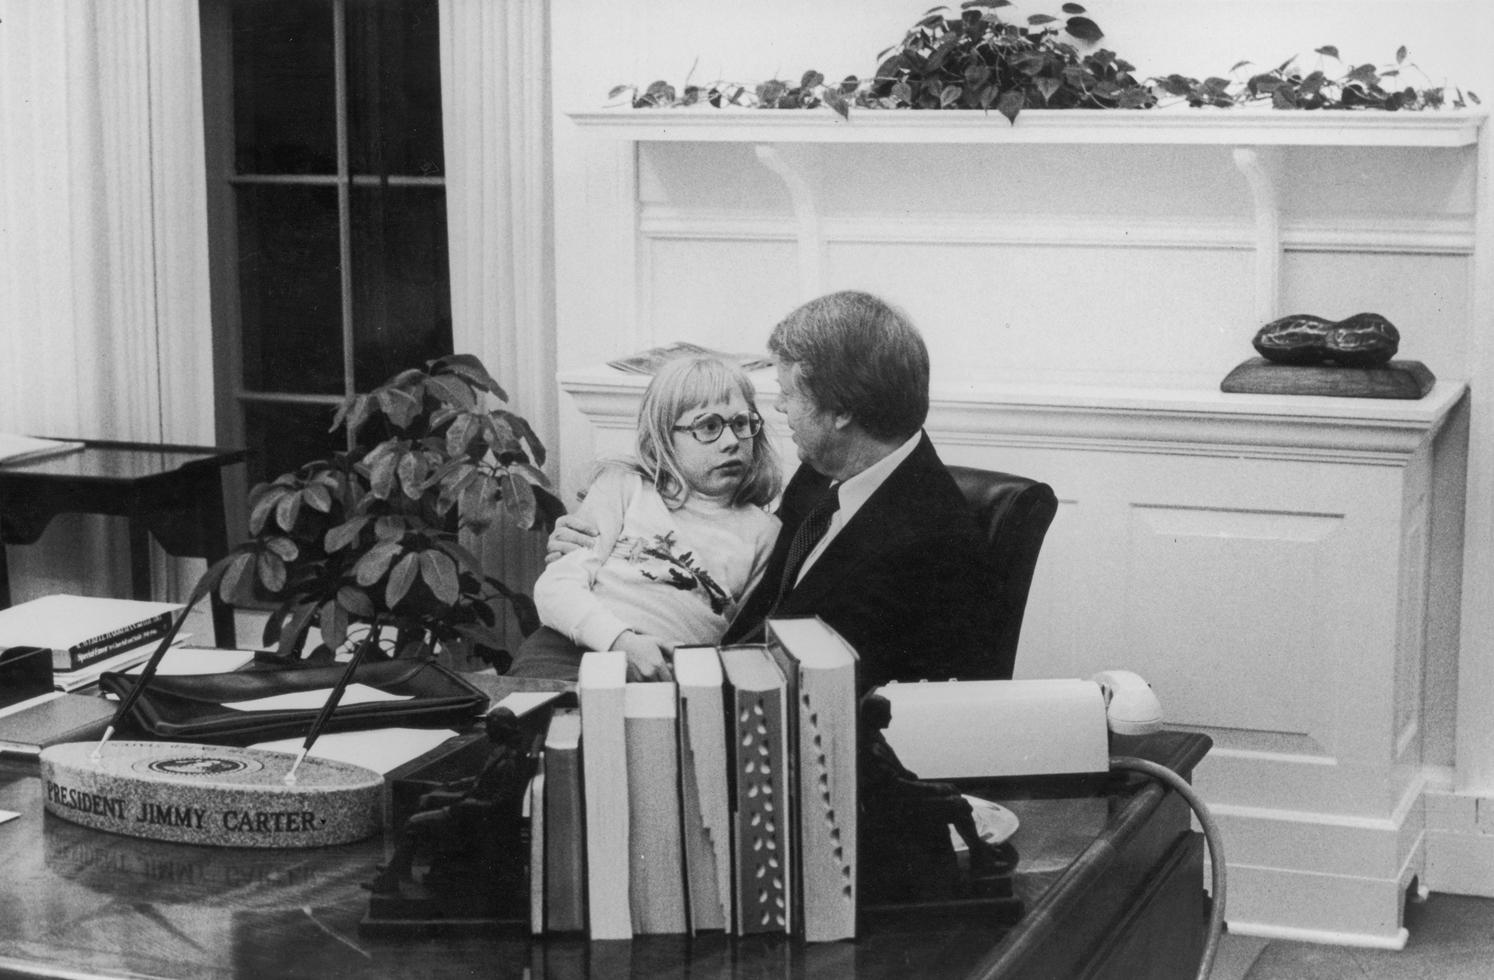 jimmy carter oval office. Jimmy Carter Oval Office P